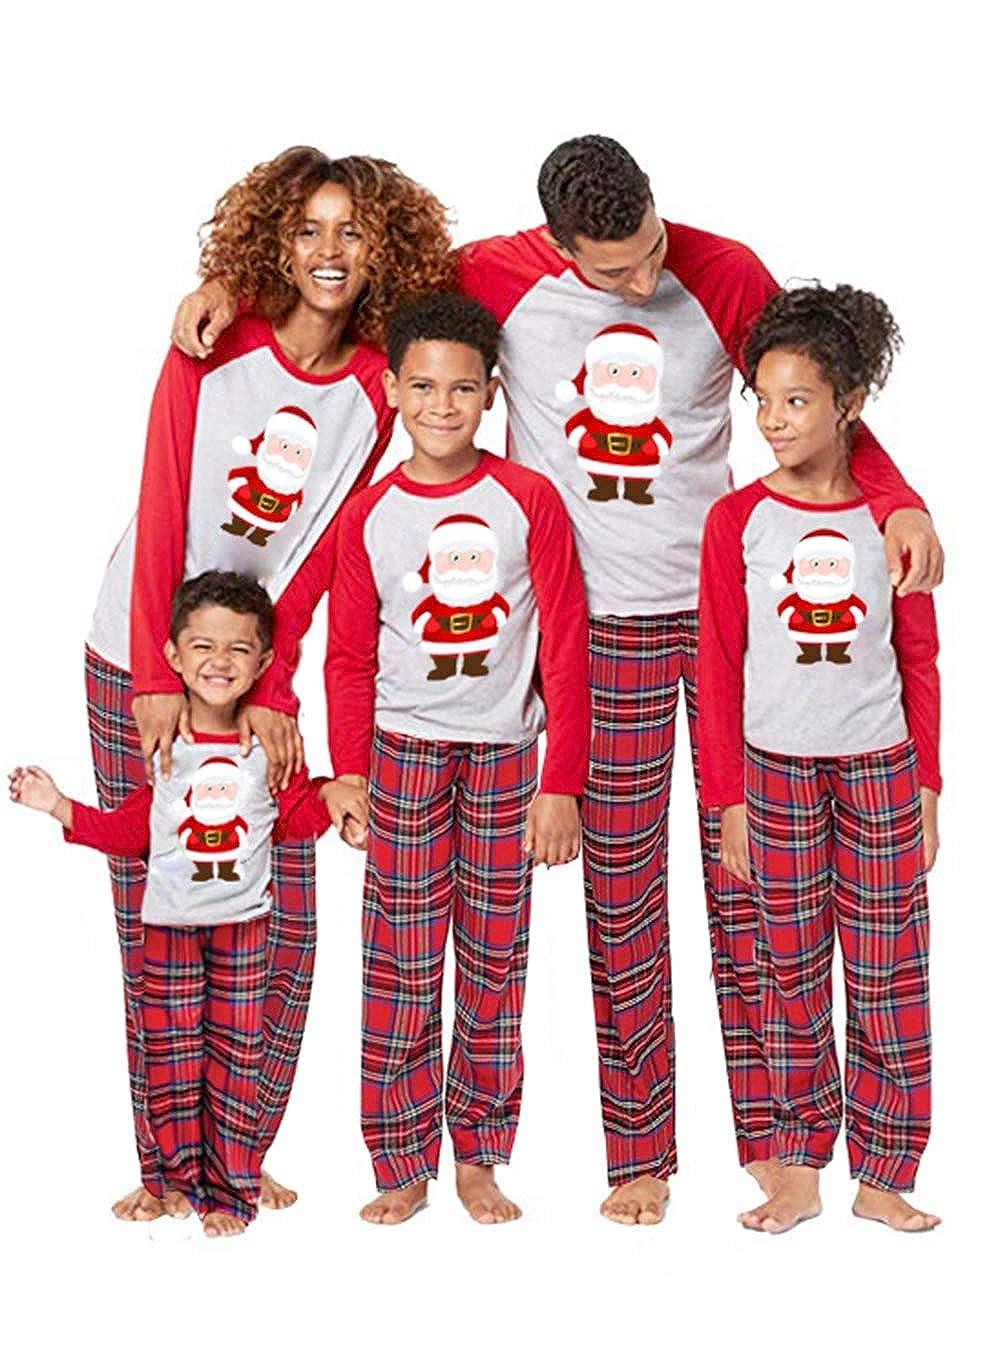 Family Matching Christmas Pajamas Santa Claus Print 2Pcs PJs Sets Long Sleeve T-Shirt+Plaid Long Pants Sleepwear Homewear